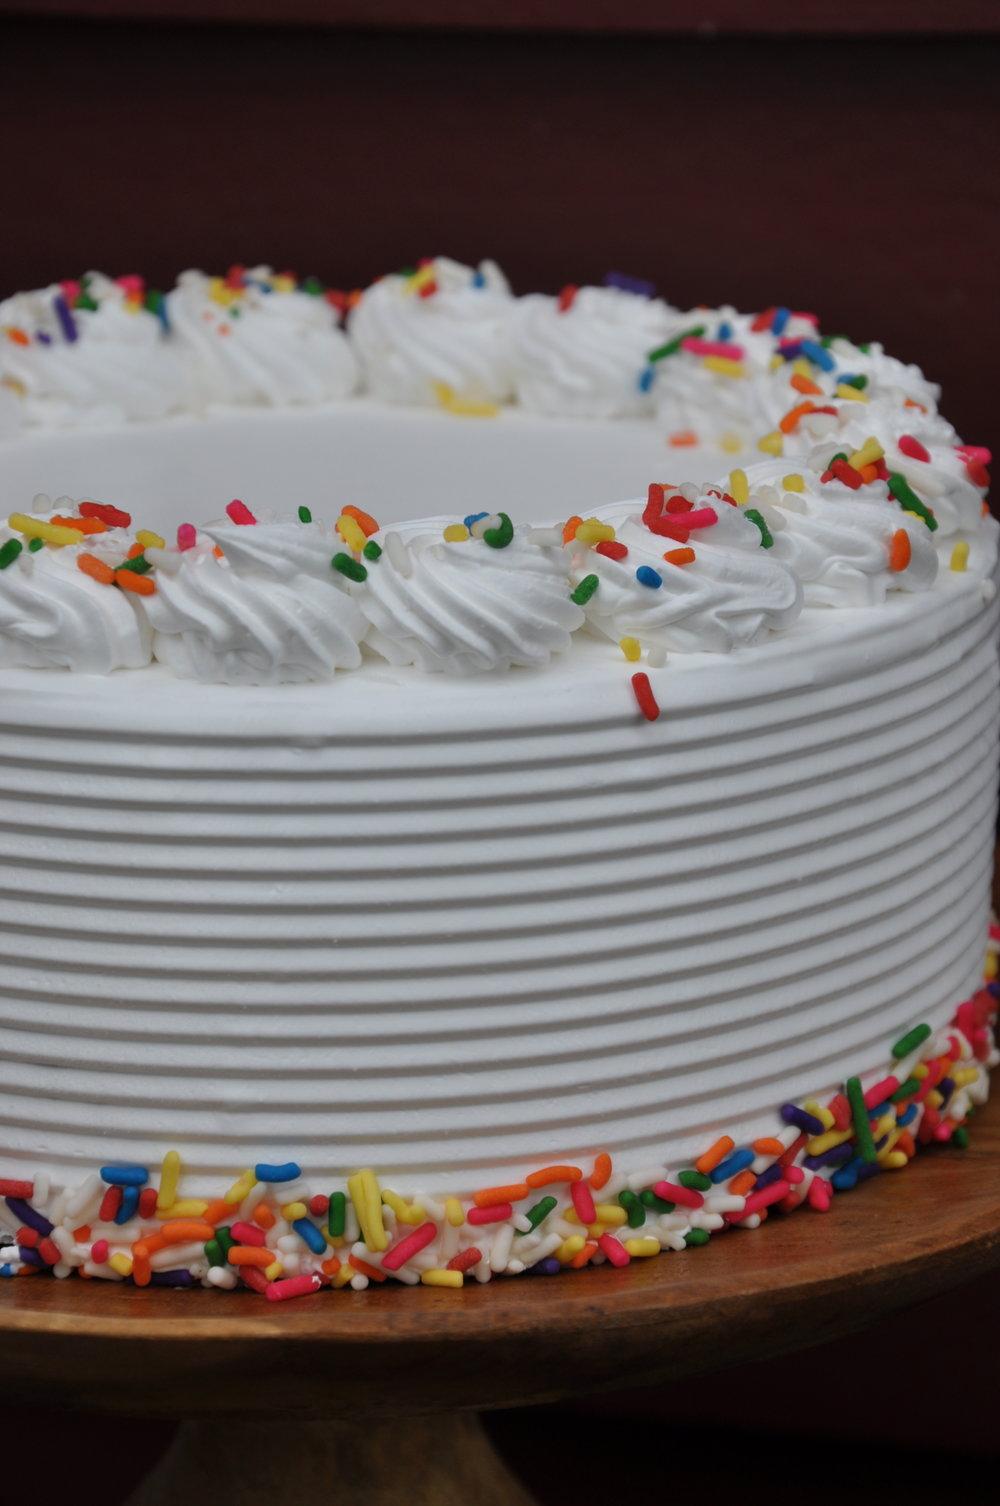 standard ice cream cake